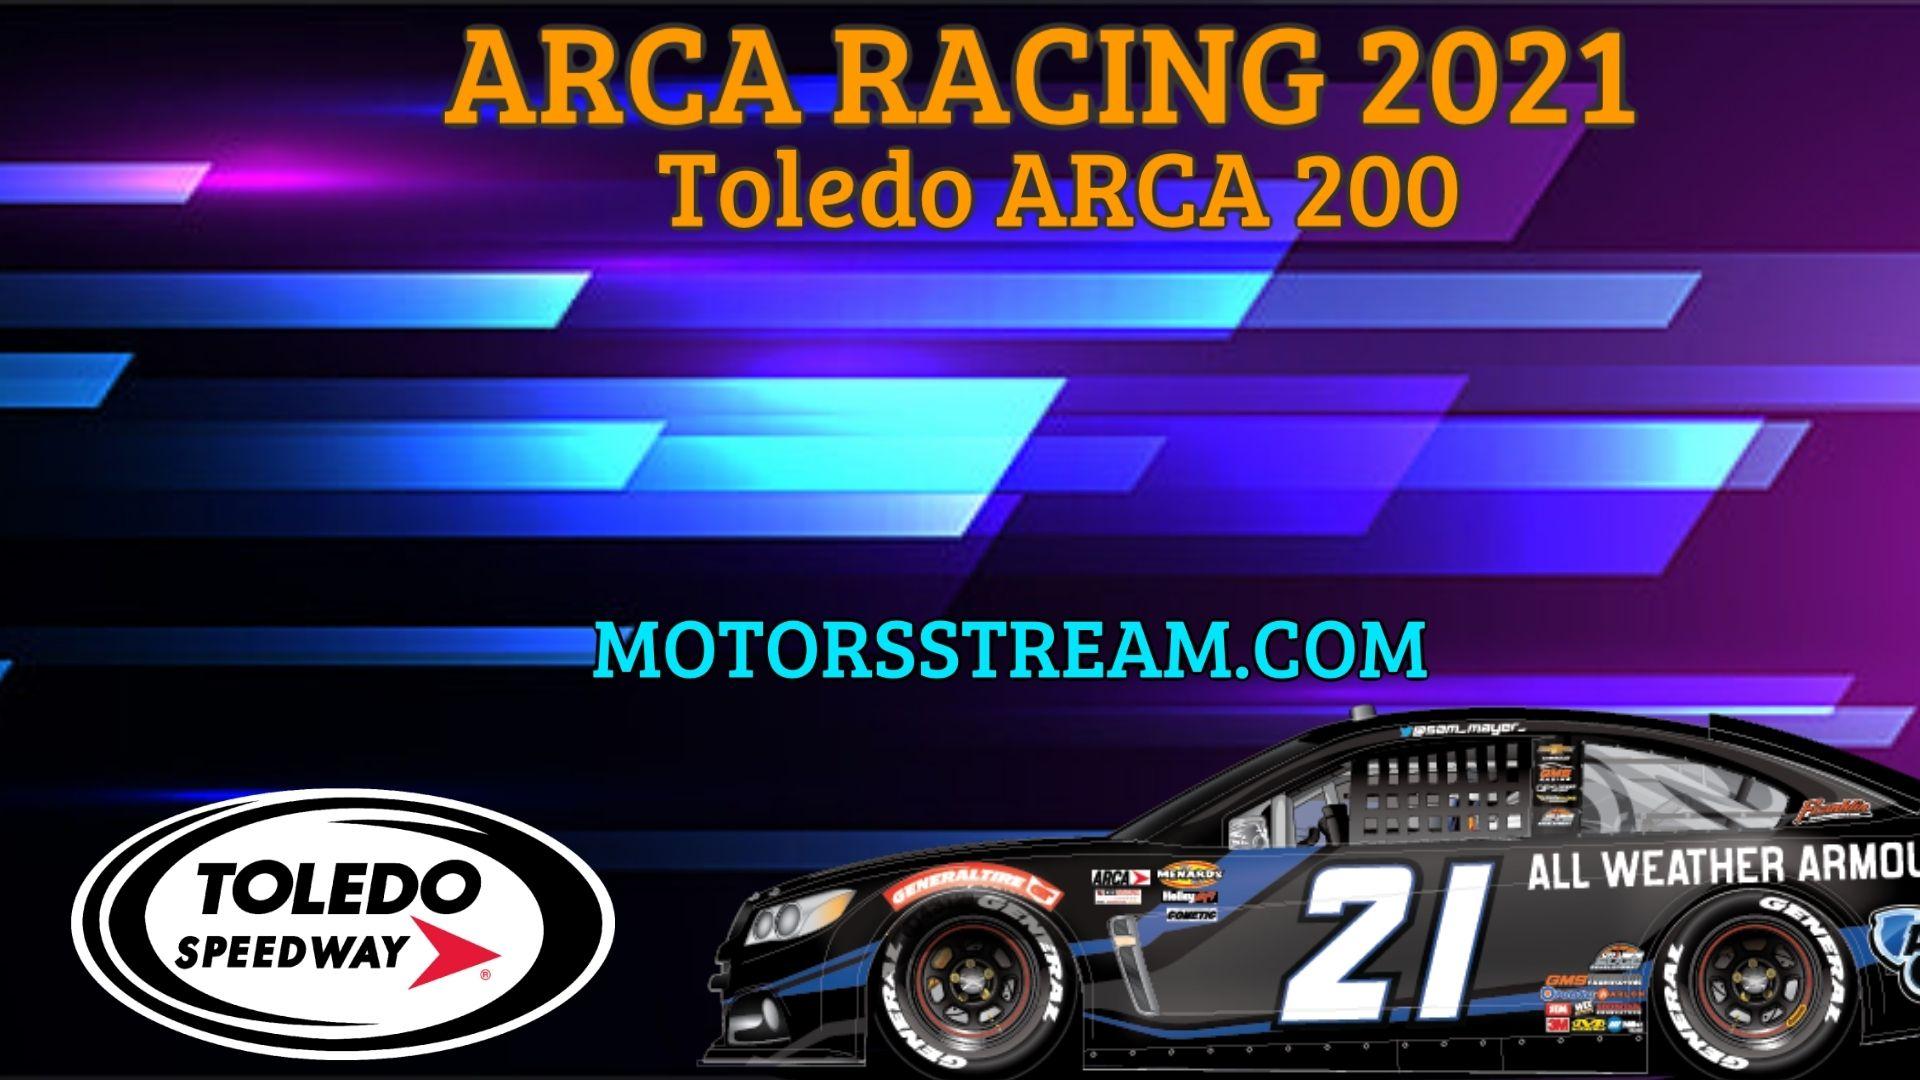 Toledo ARCA 200 Live Stream 2021 Arca Racing